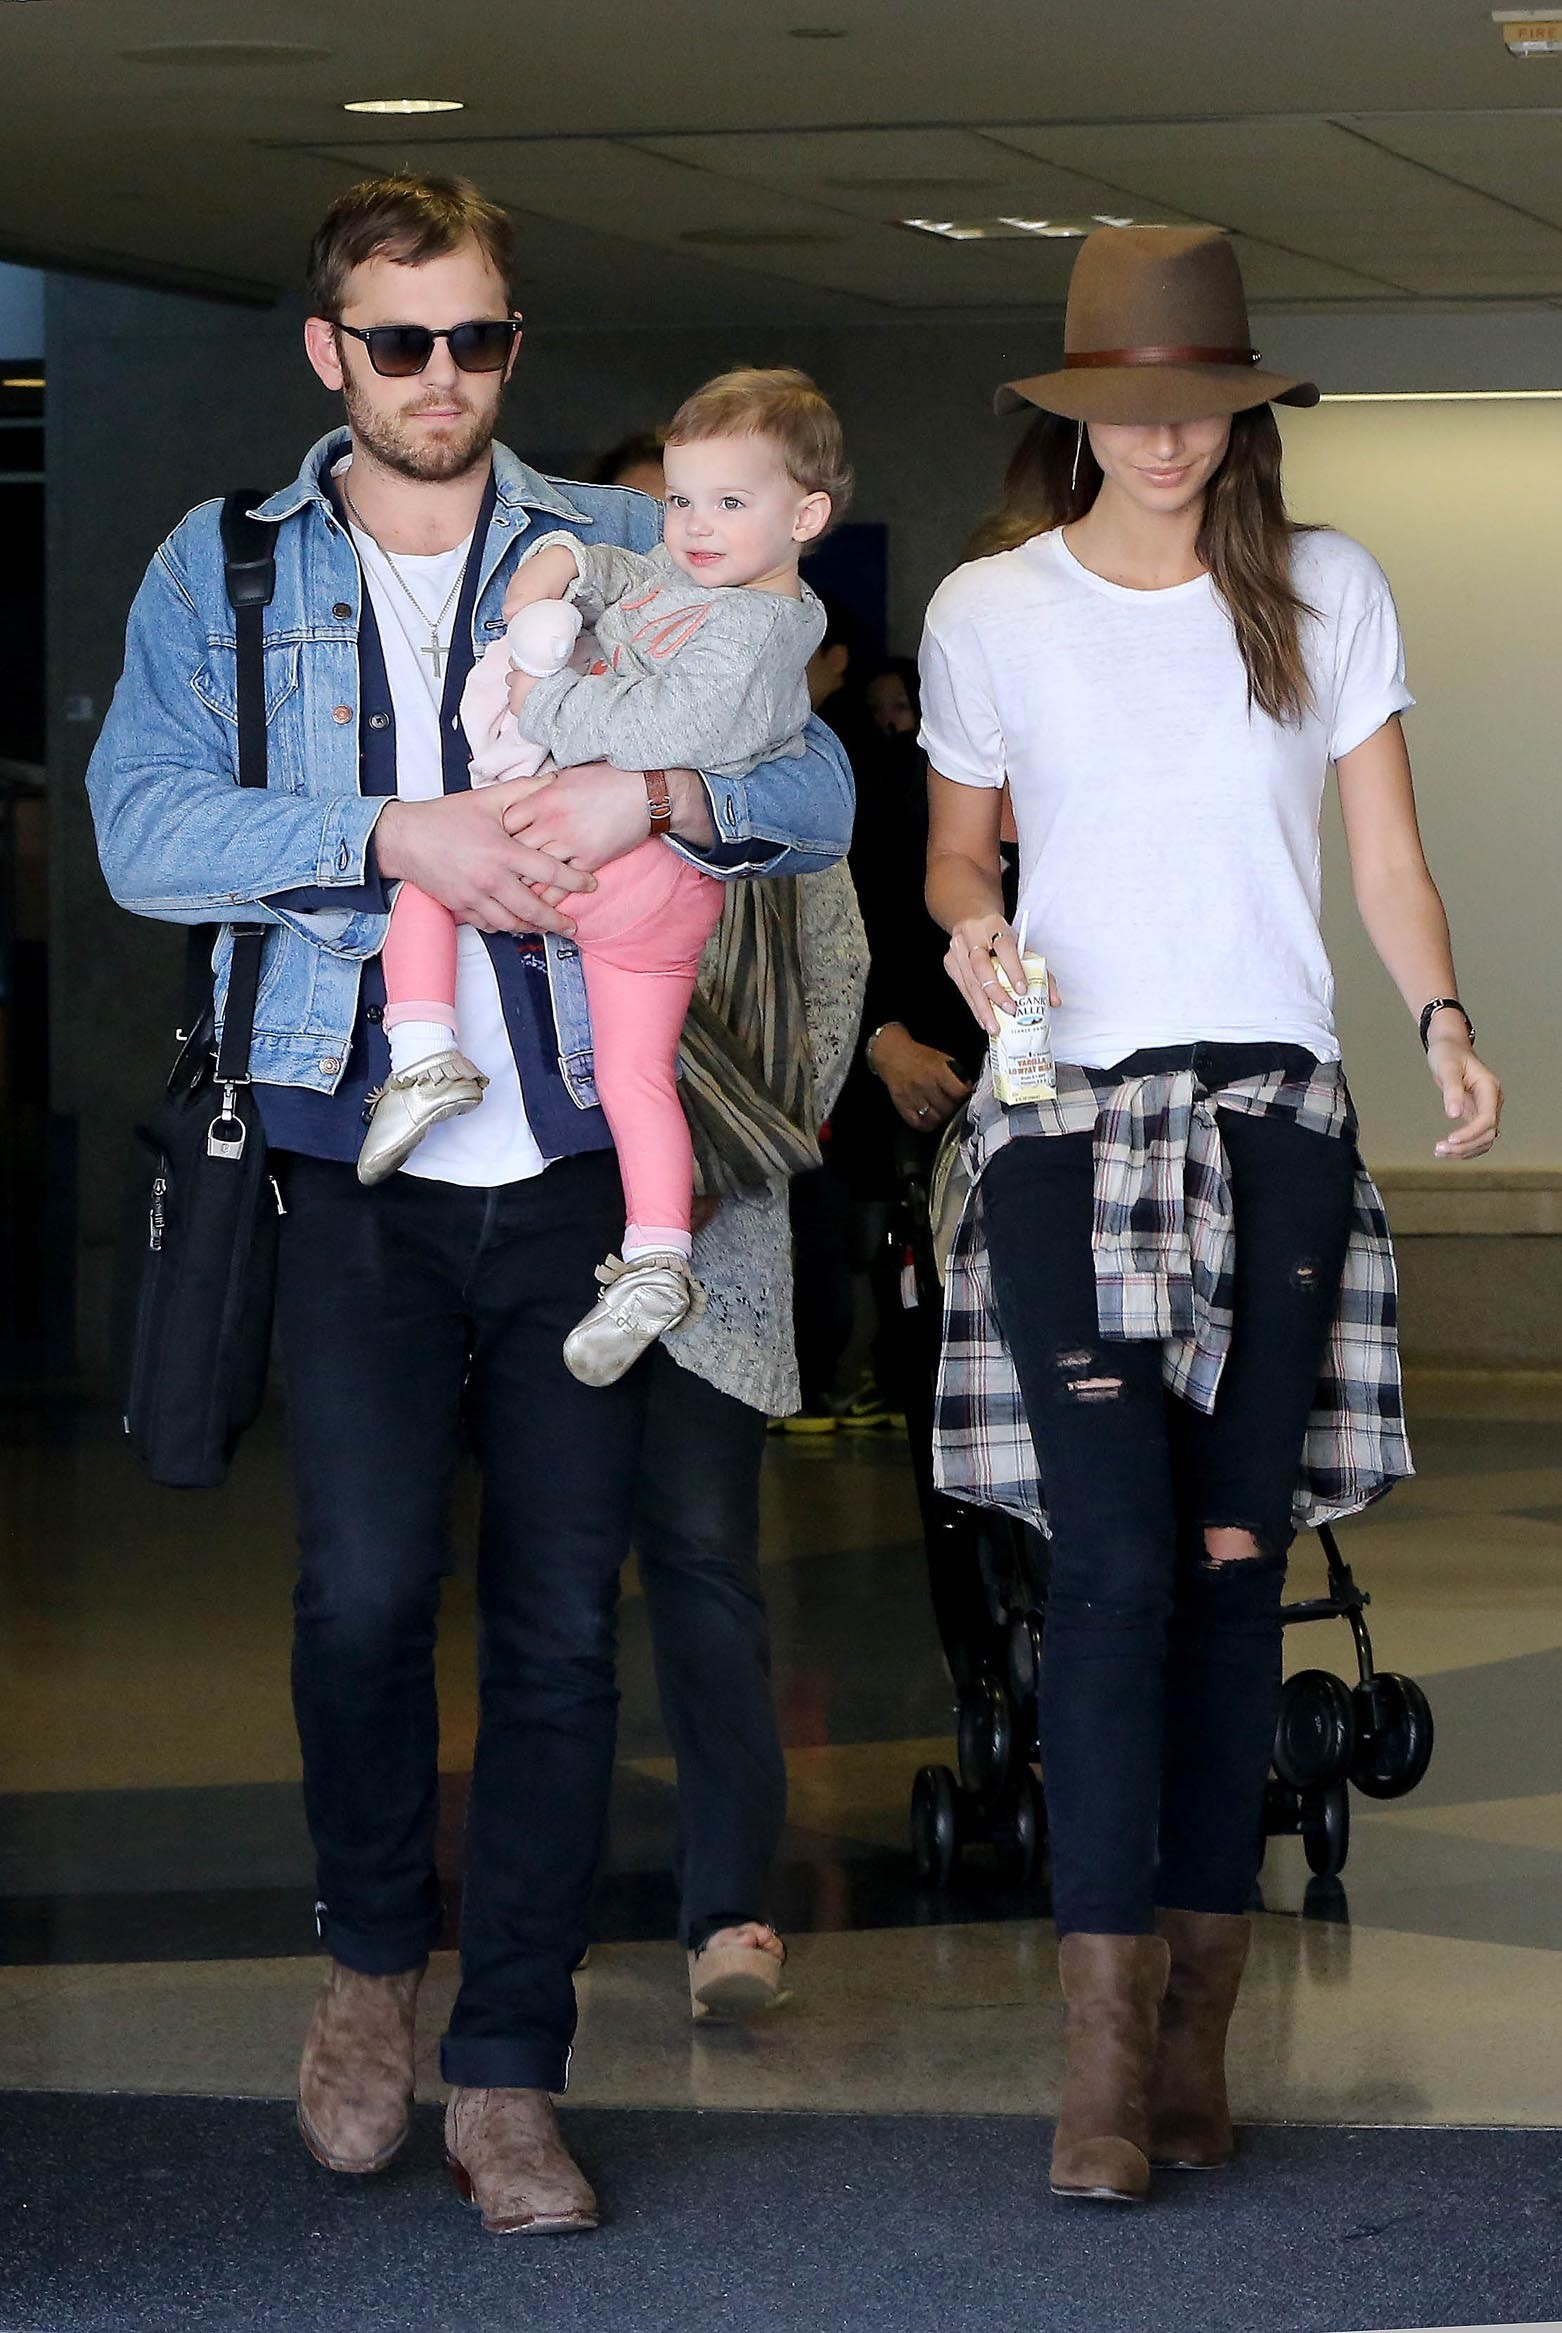 Lily Aldridge, husband Caleb Followill, daughter Dixie Pearl